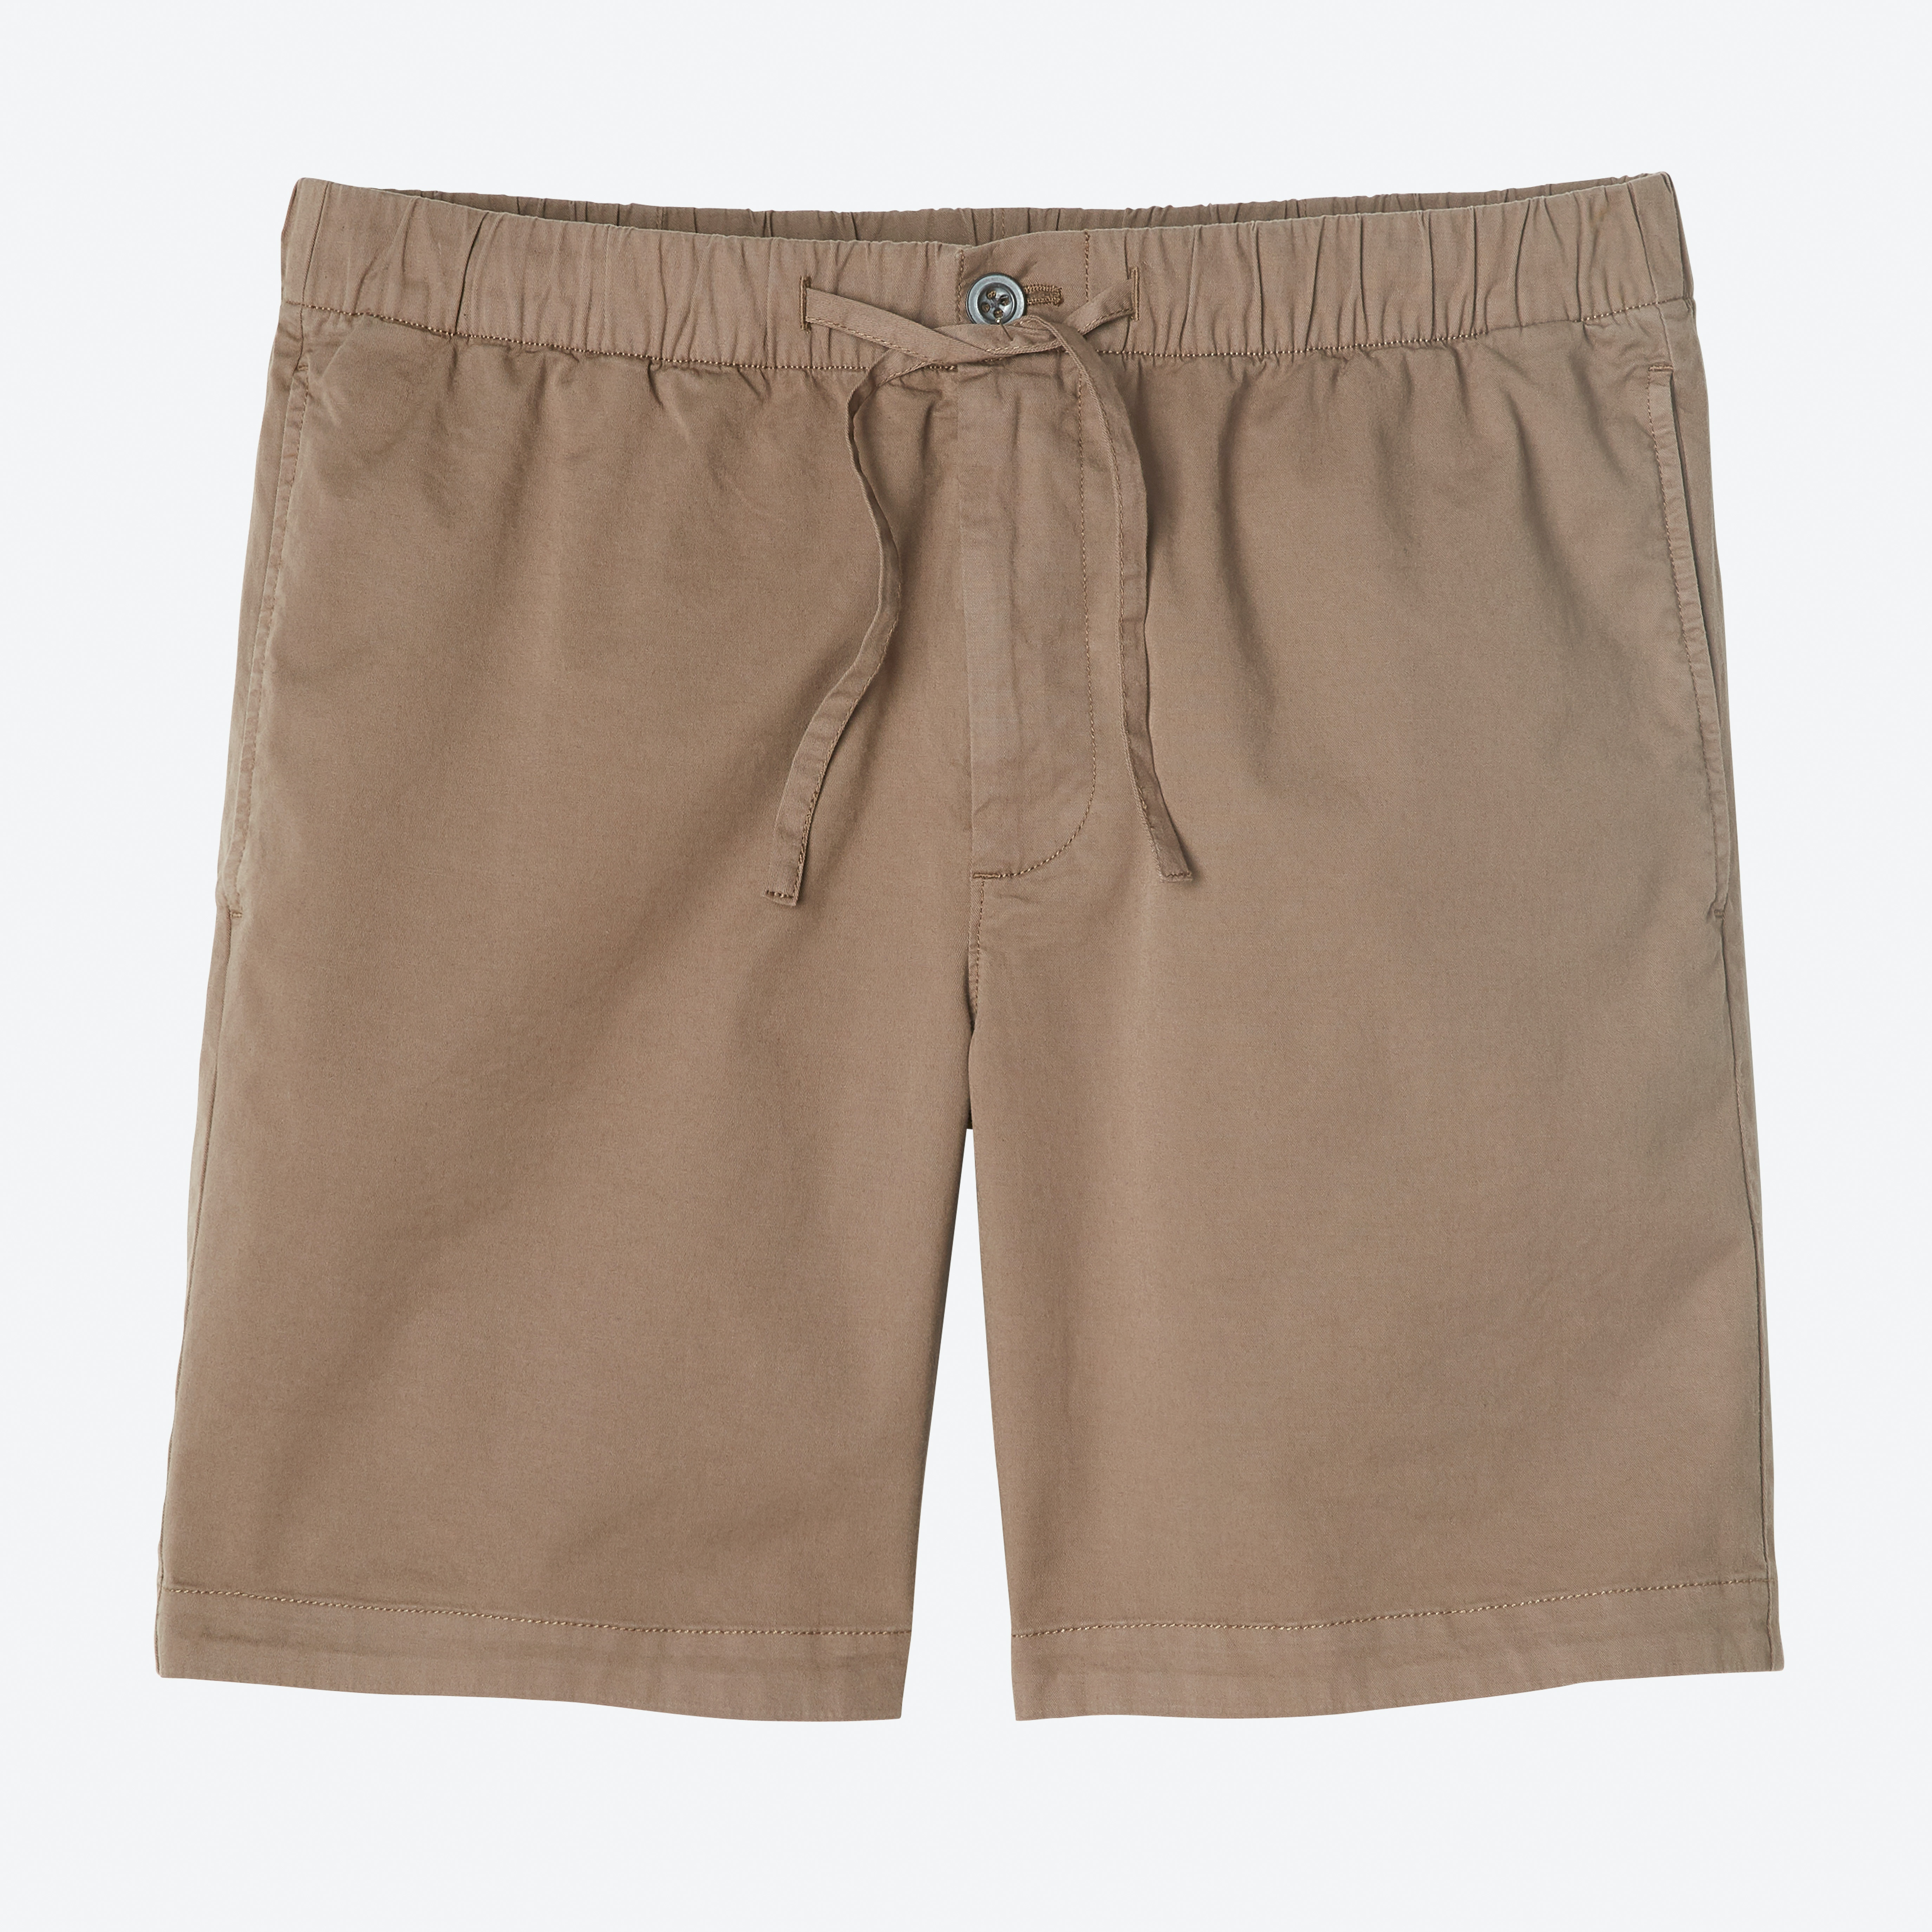 The Beach Short